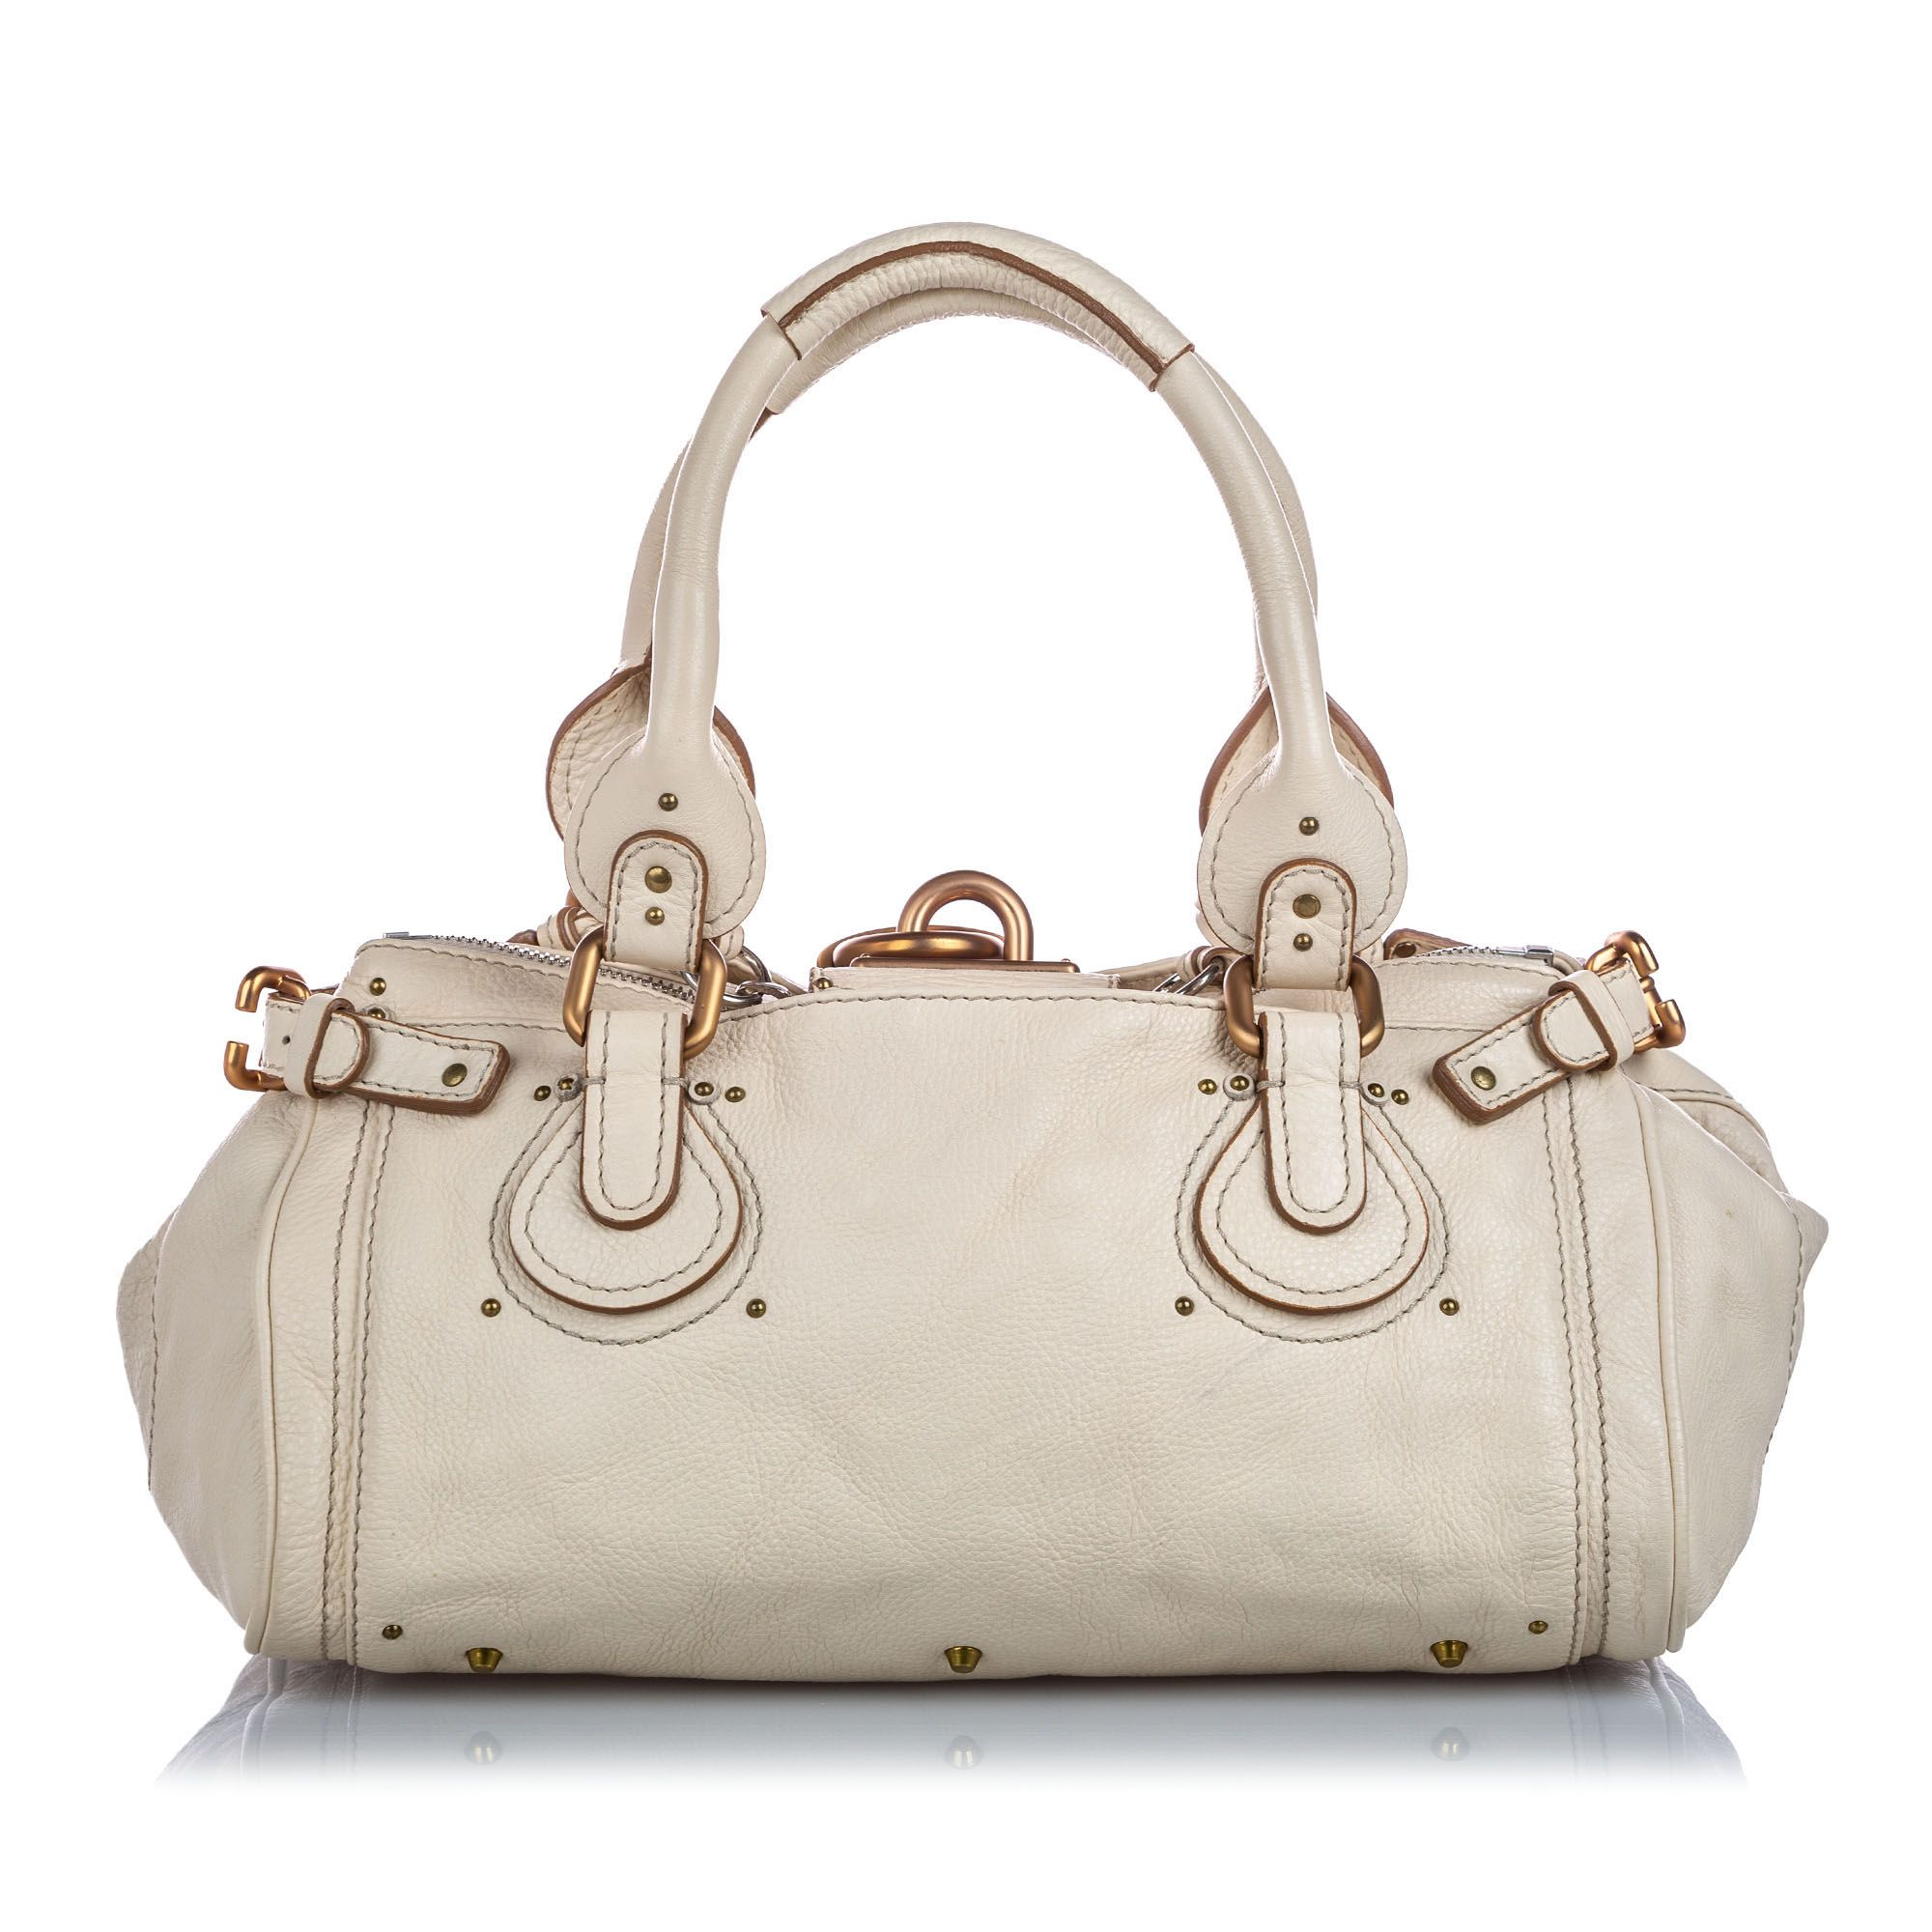 Vintage Chloe Leather Paddington Handbag White